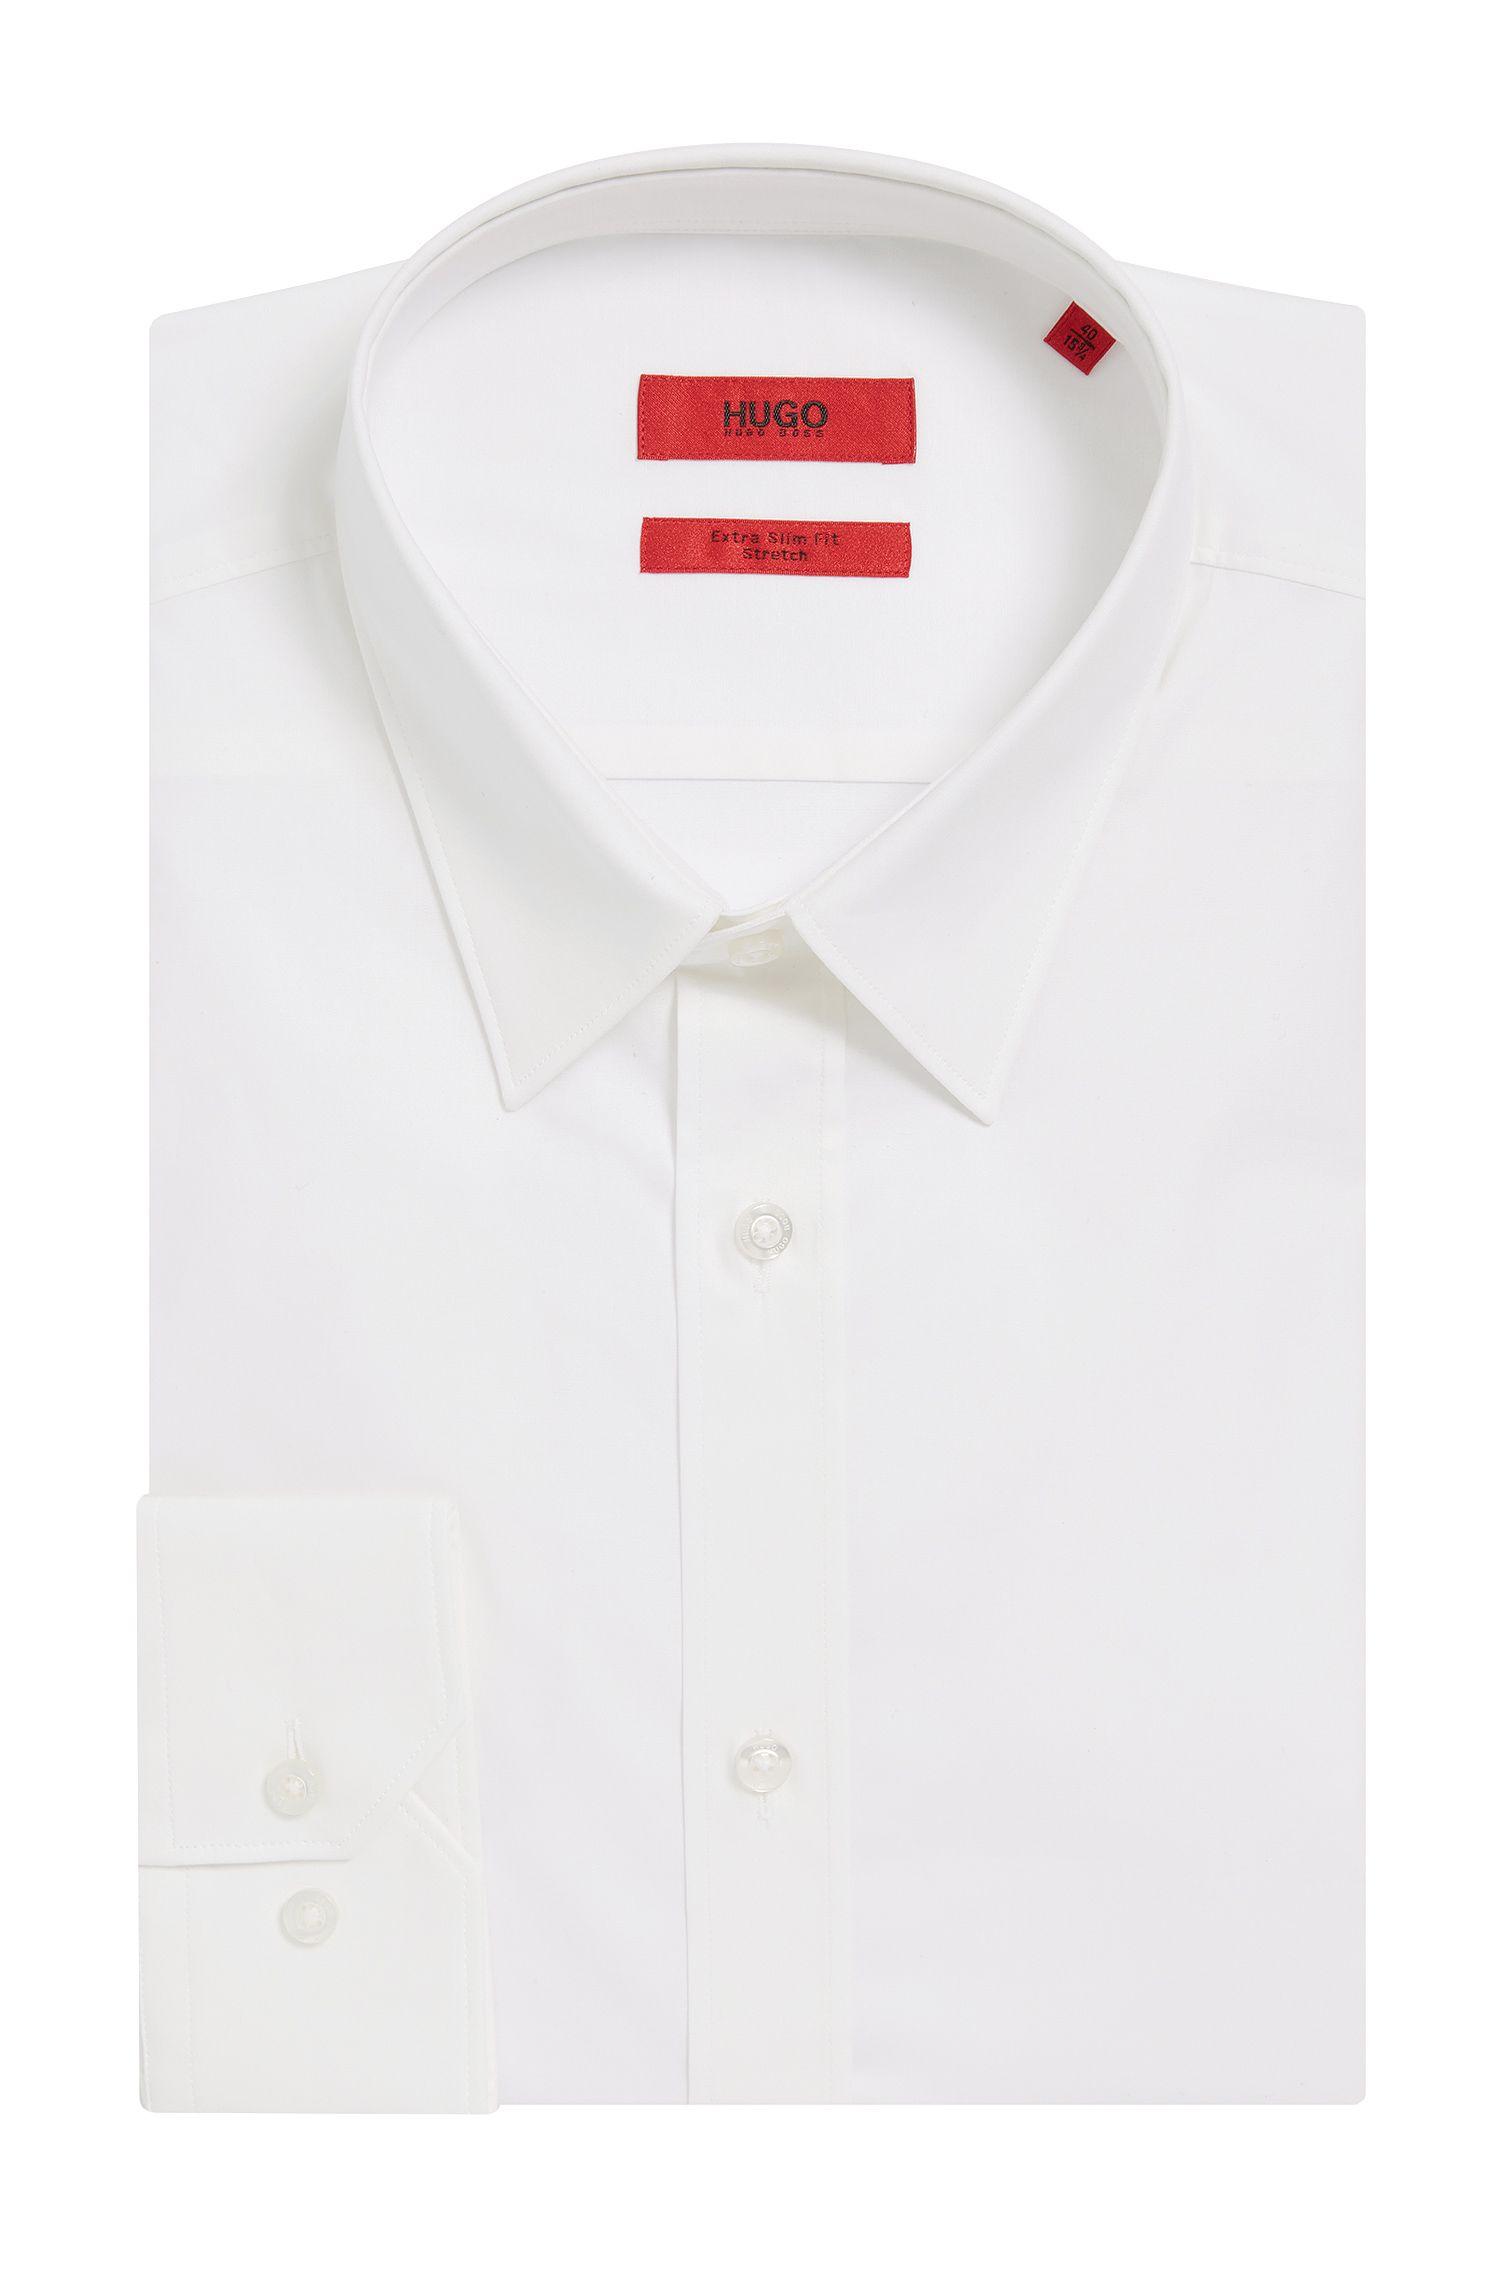 Unifarbenes Slim-Fit Hemd aus Stretch-Baumwolle: 'Elisha'